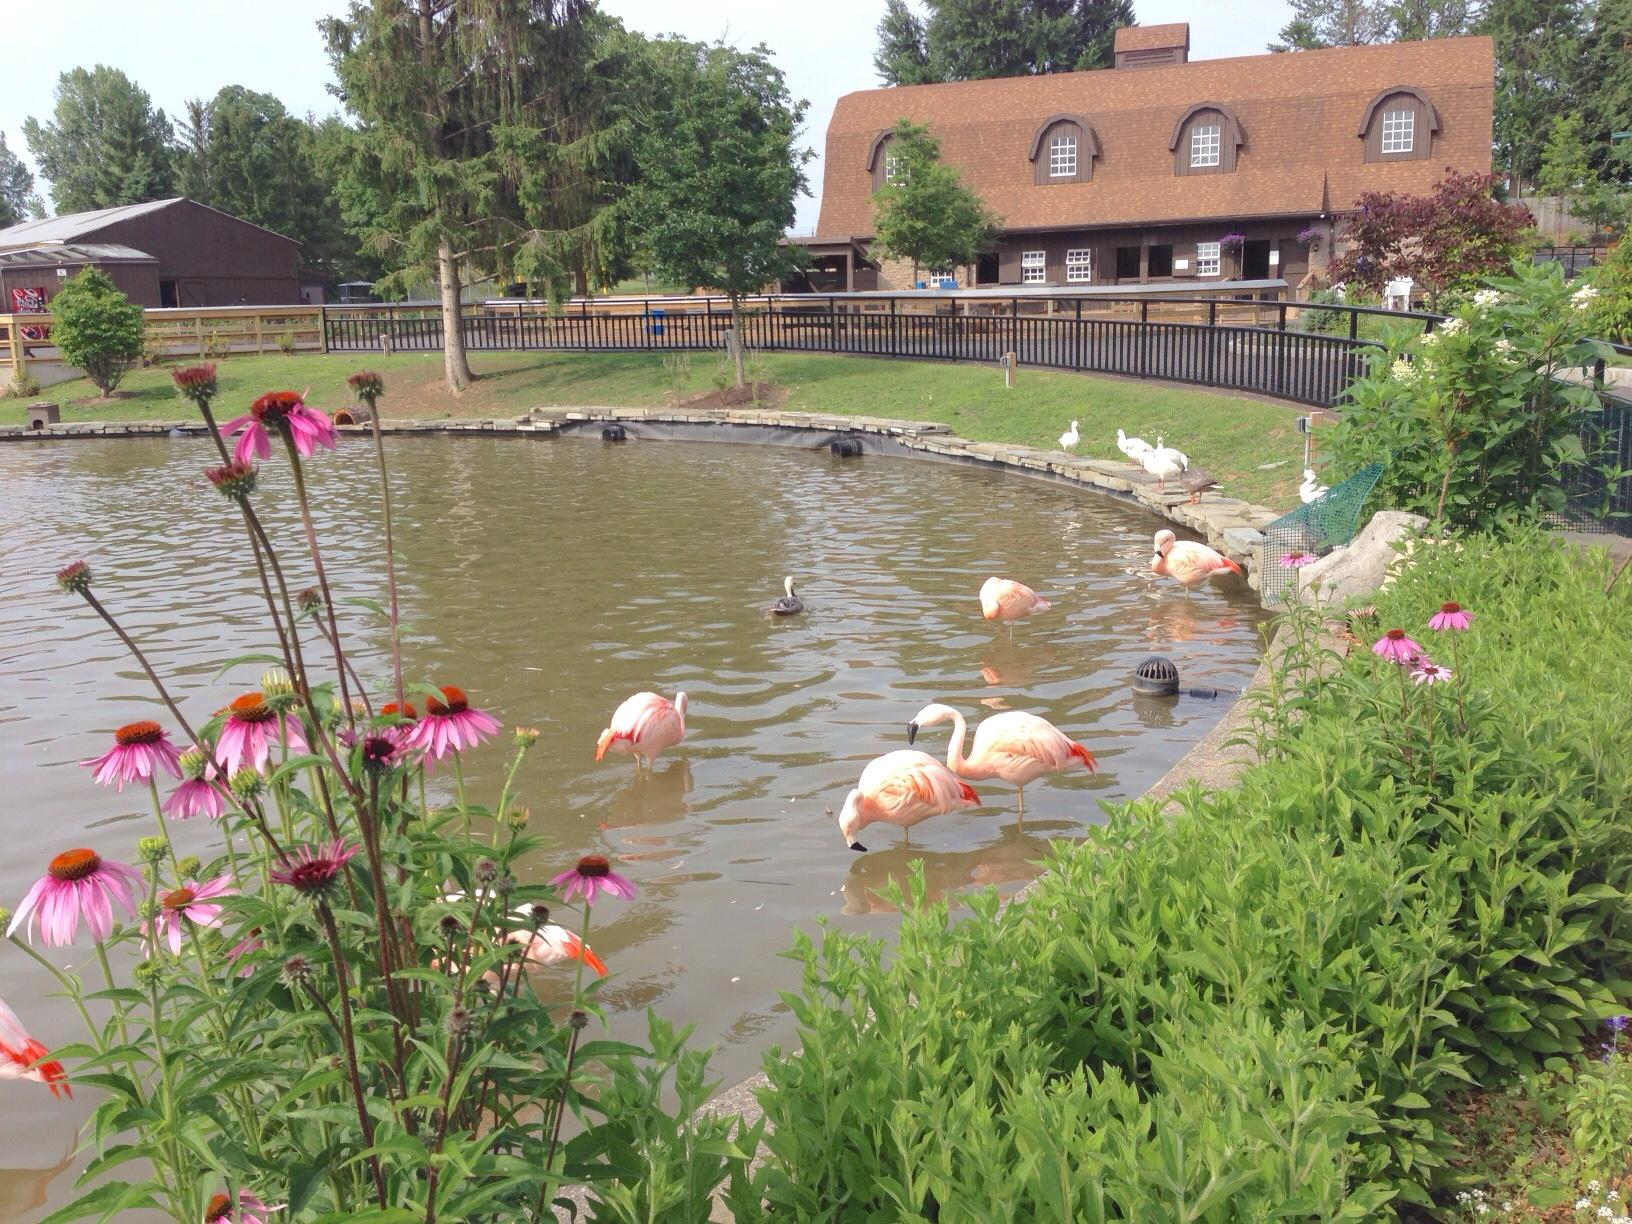 syracuse s rosamond gifford zoo celebrates 100 years wrvo public media